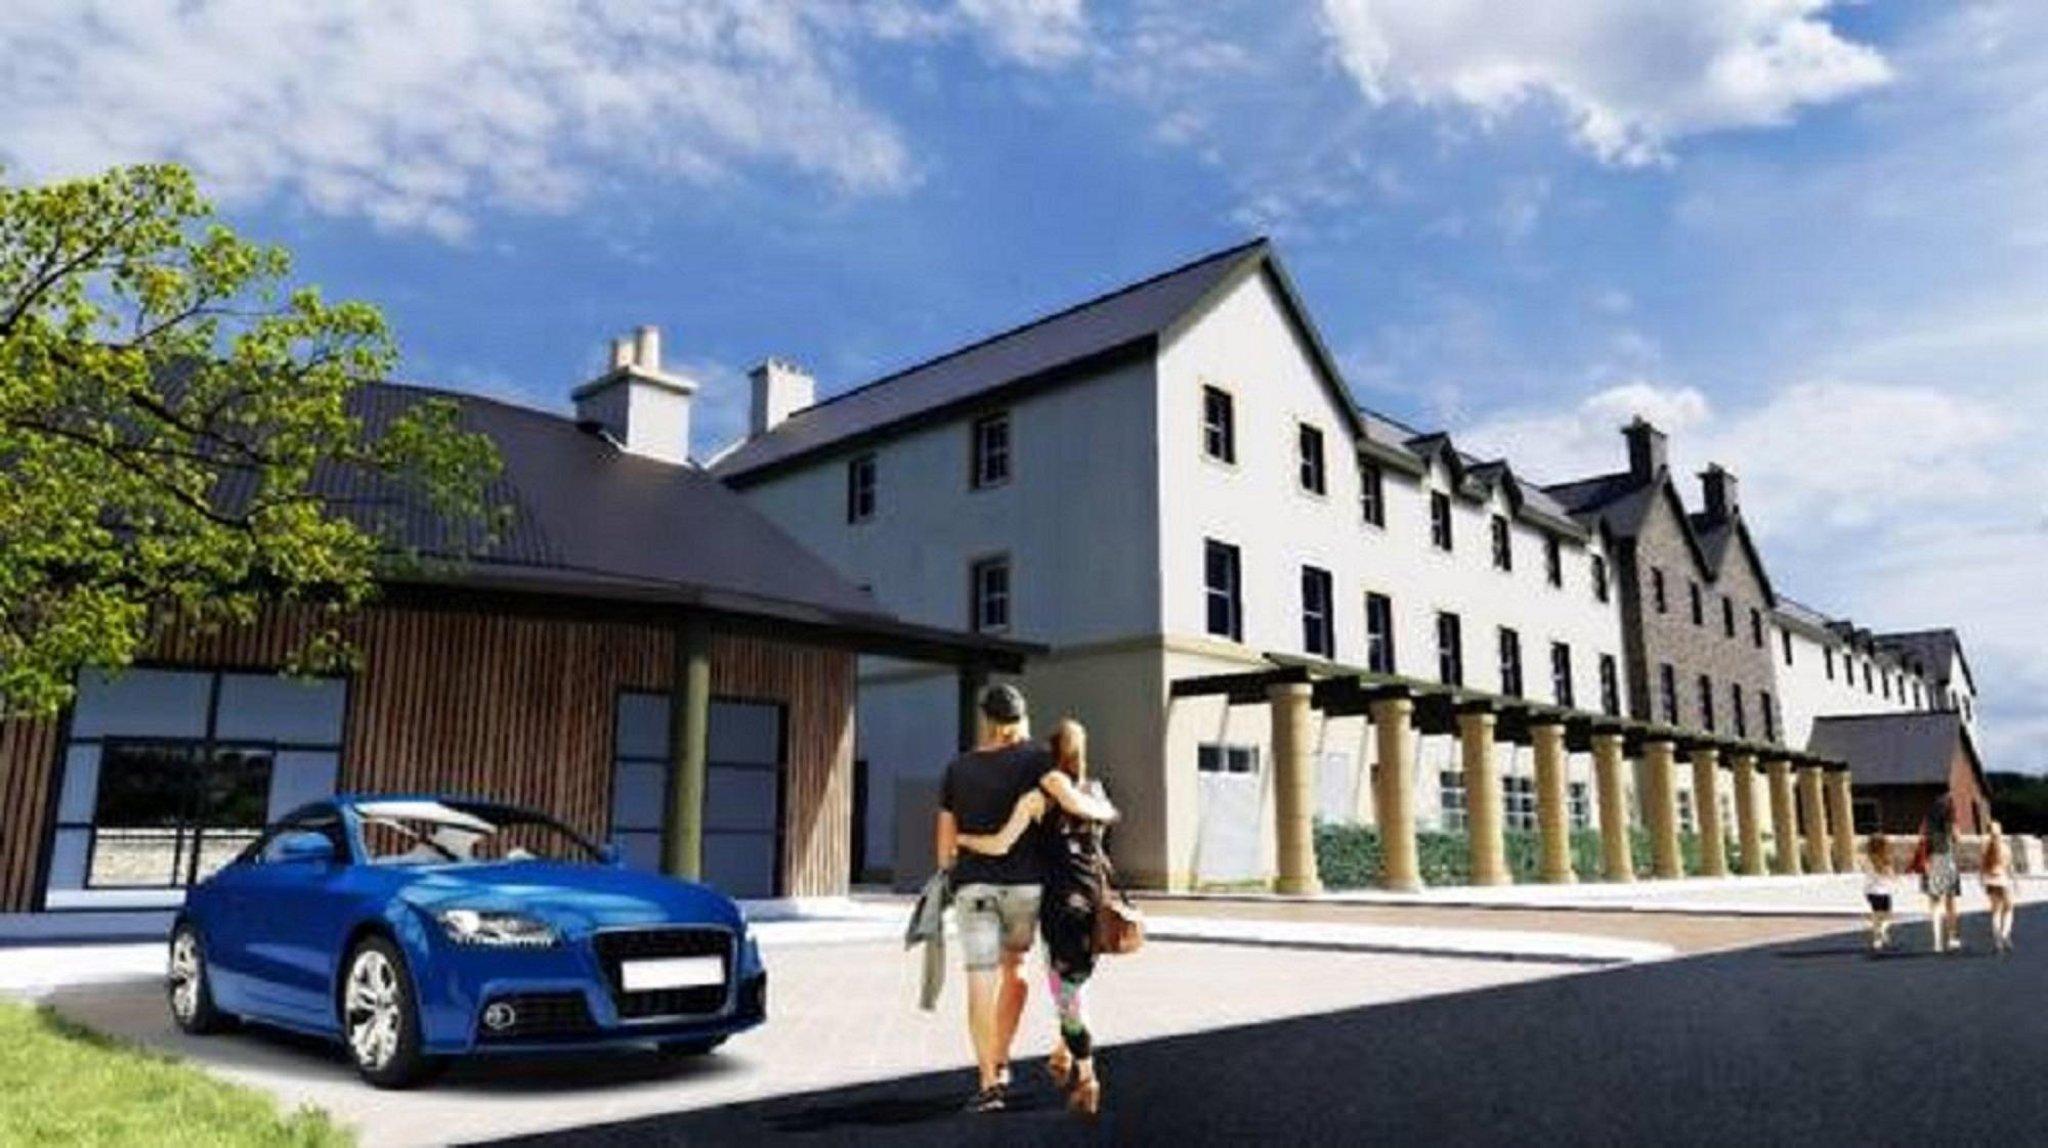 Tomatin Trading Company memajukan rencana untuk pengembangan Highland senilai £12 juta setelah kemenangan legal